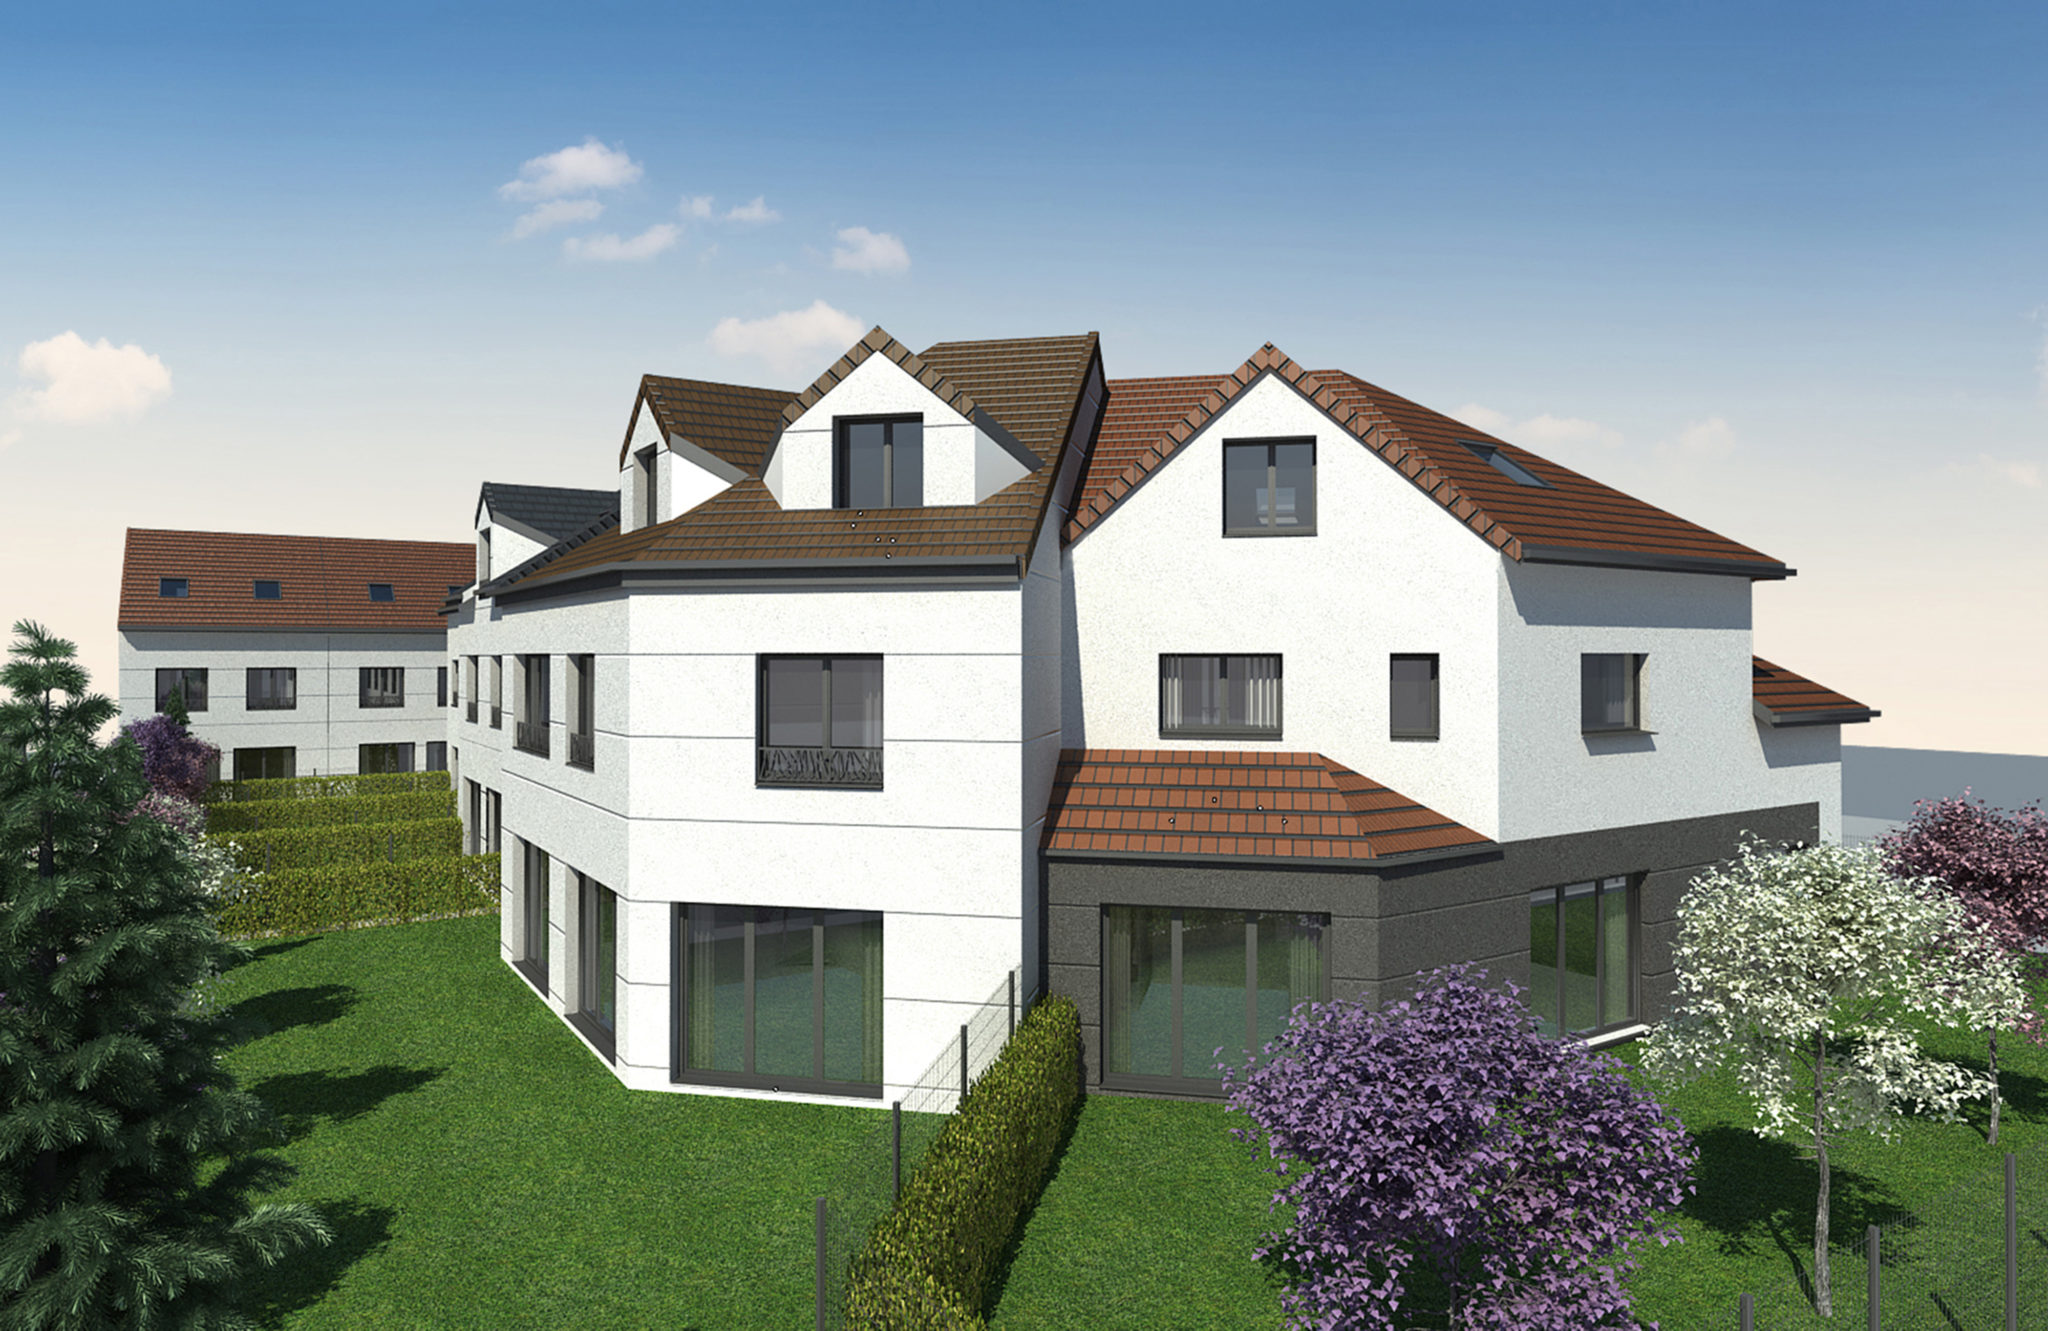 Plan 3D de la vue d'ensemble de la construction de villas